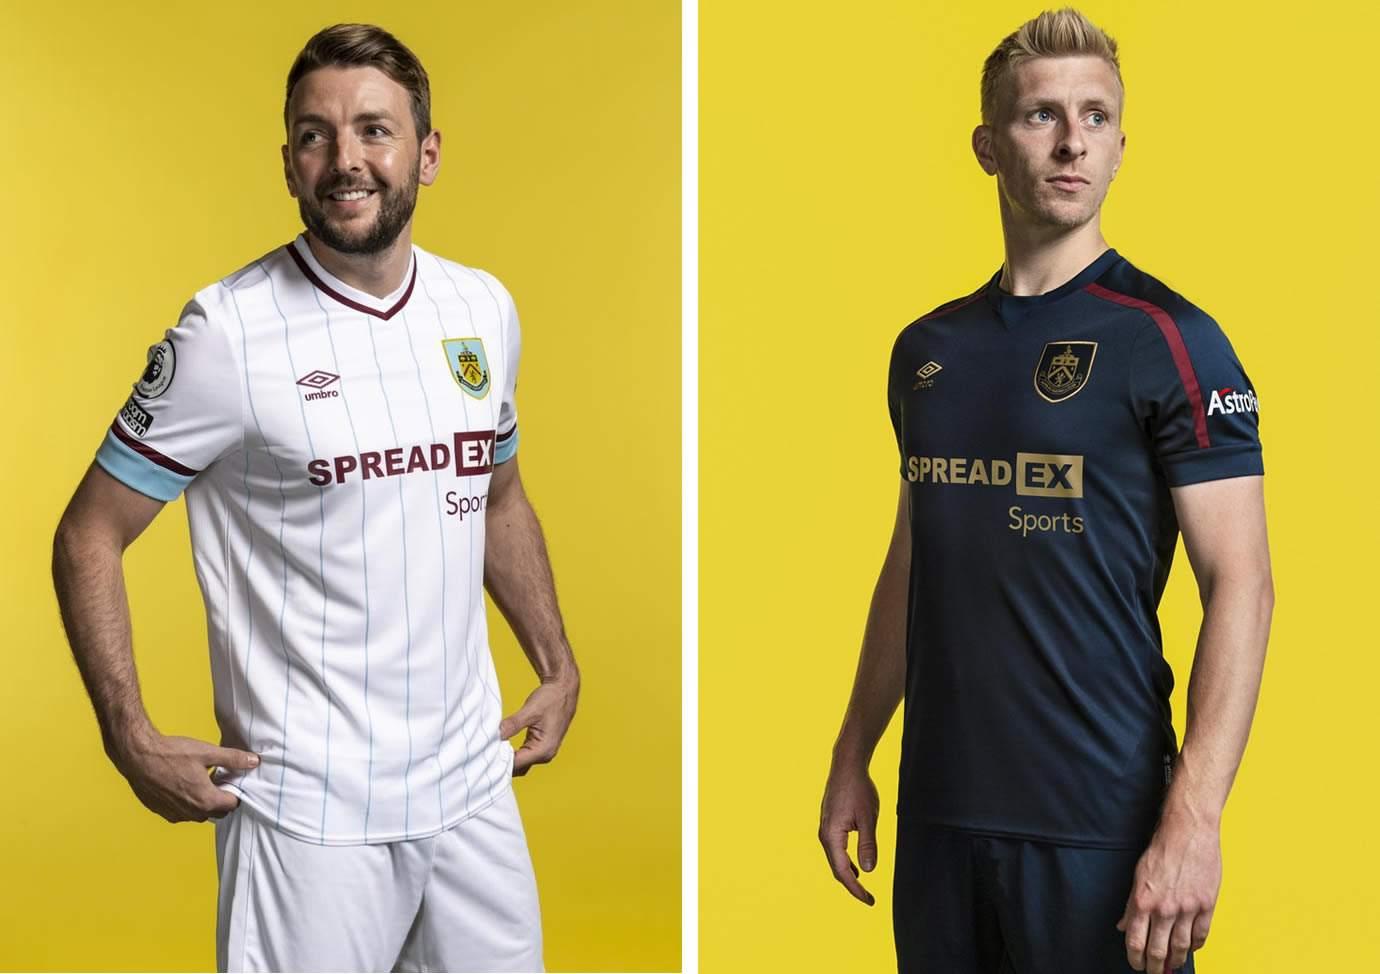 Camiseta suplente y tercera Umbro del Burnley FC 2021/22